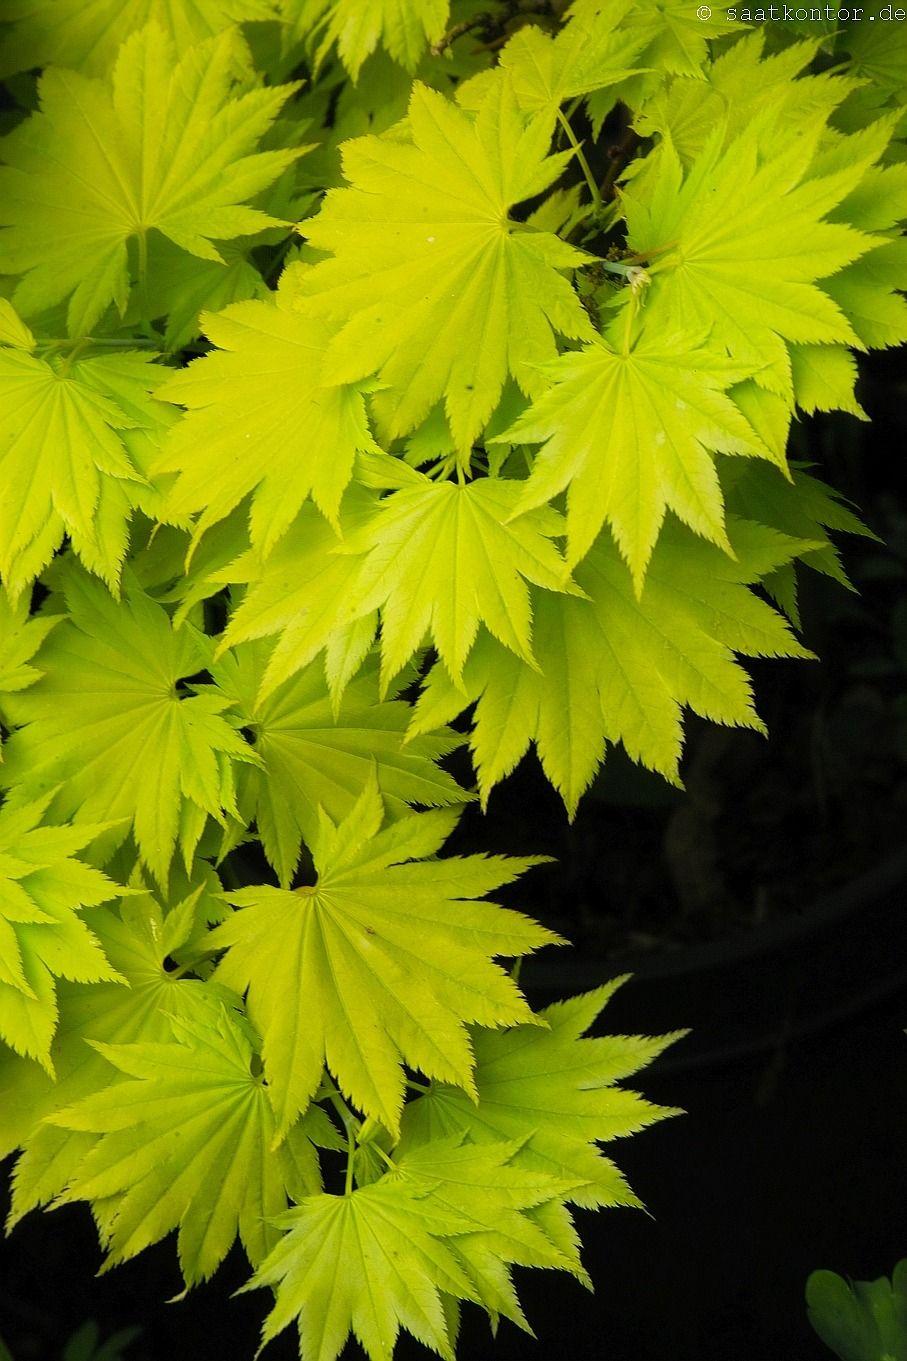 Japanischer Goldahorn Acer Shirasawanum Aureum Verdant 緑